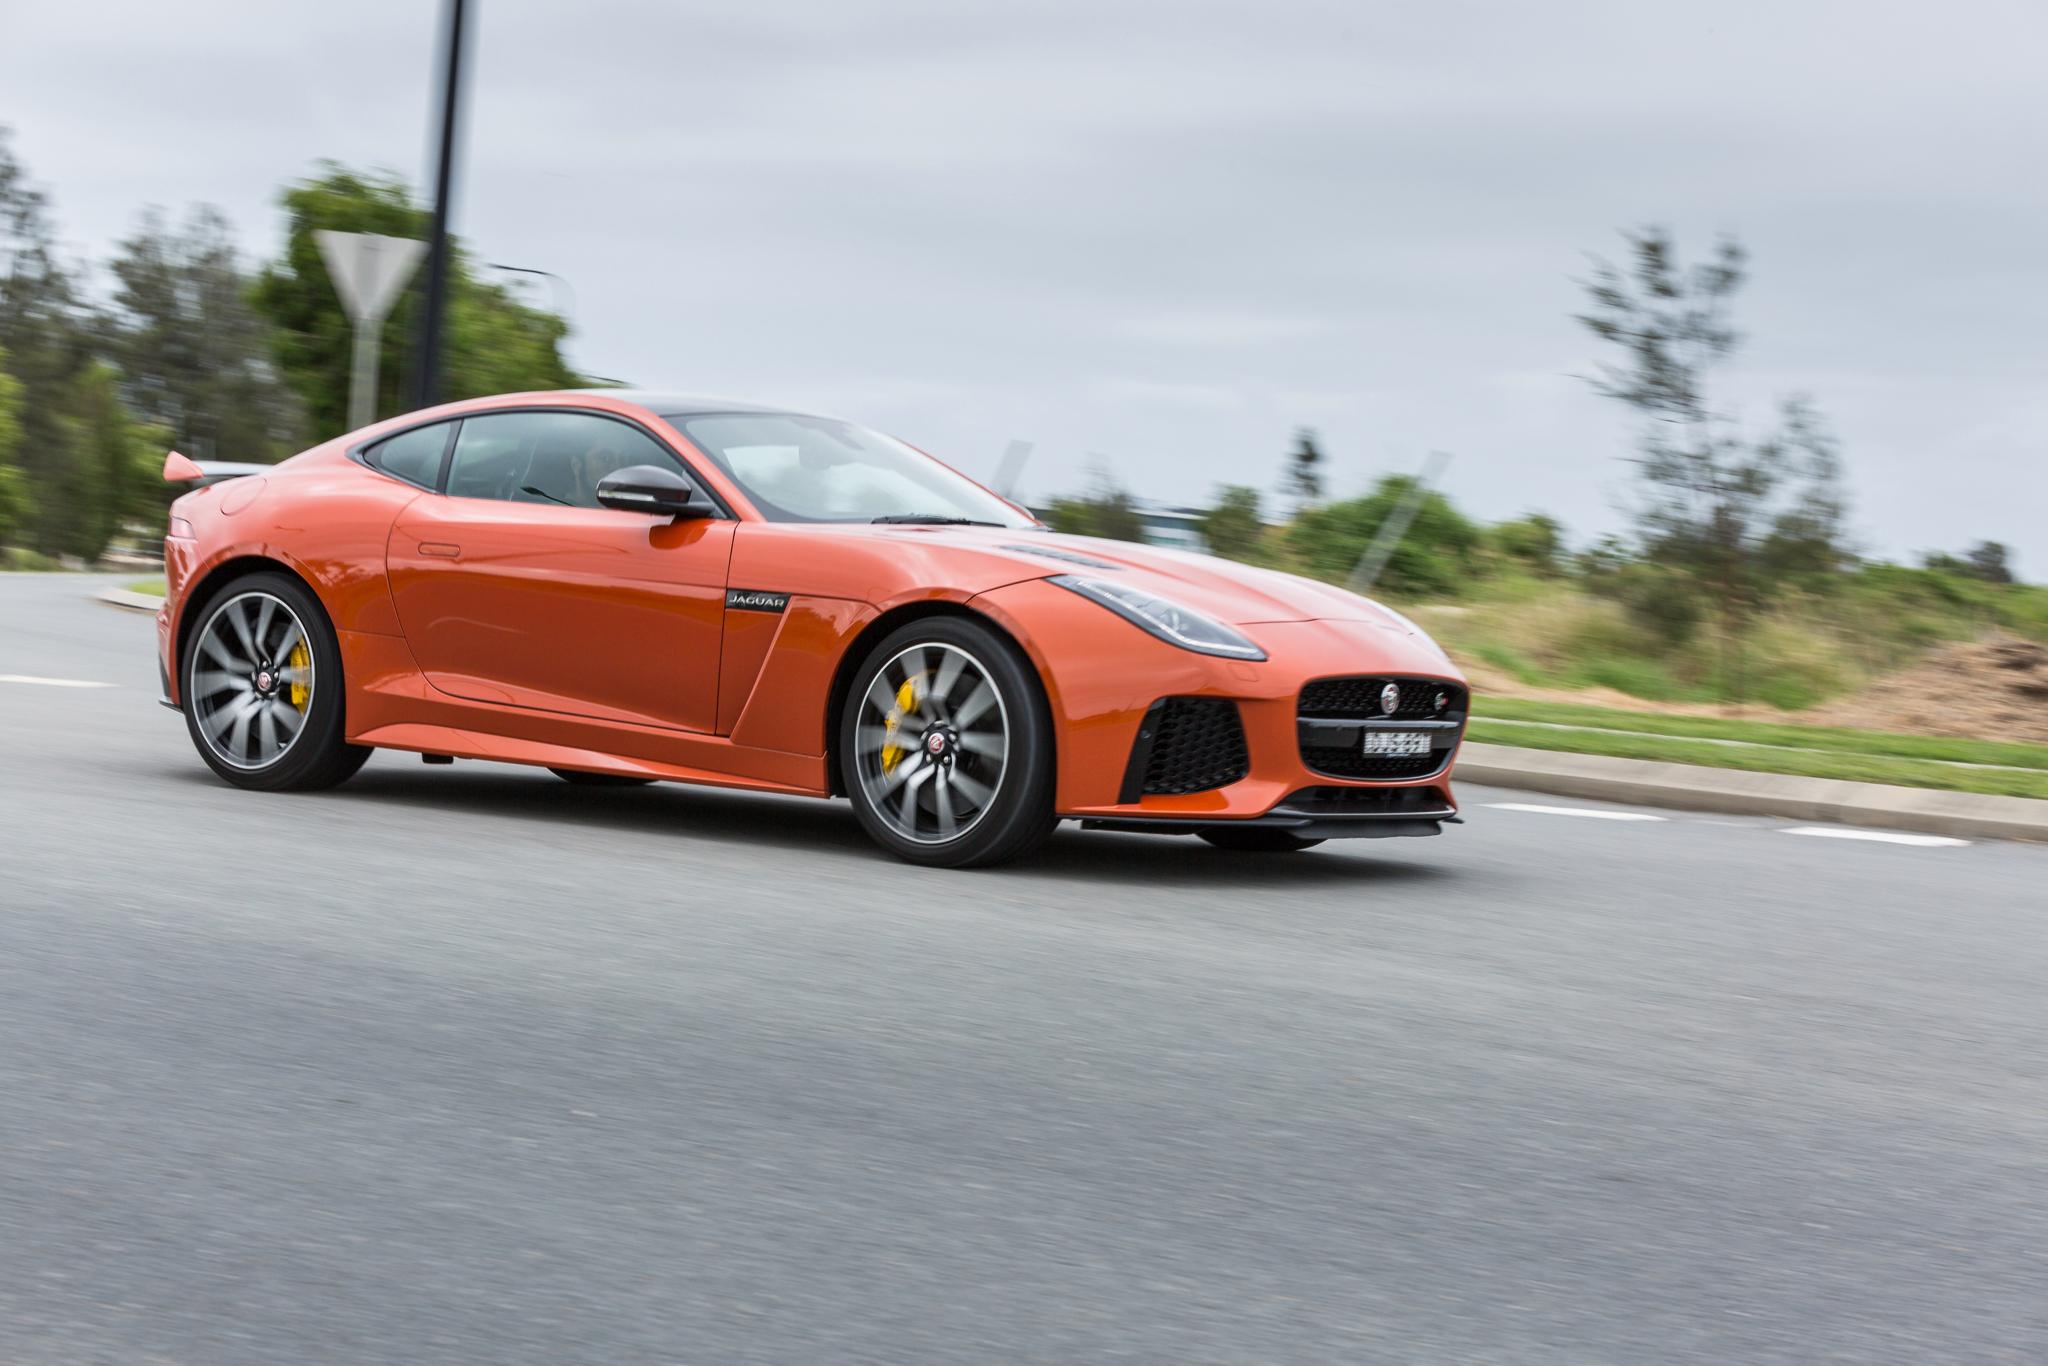 2017 Jaguar F-Type SVR review | CarAdvice